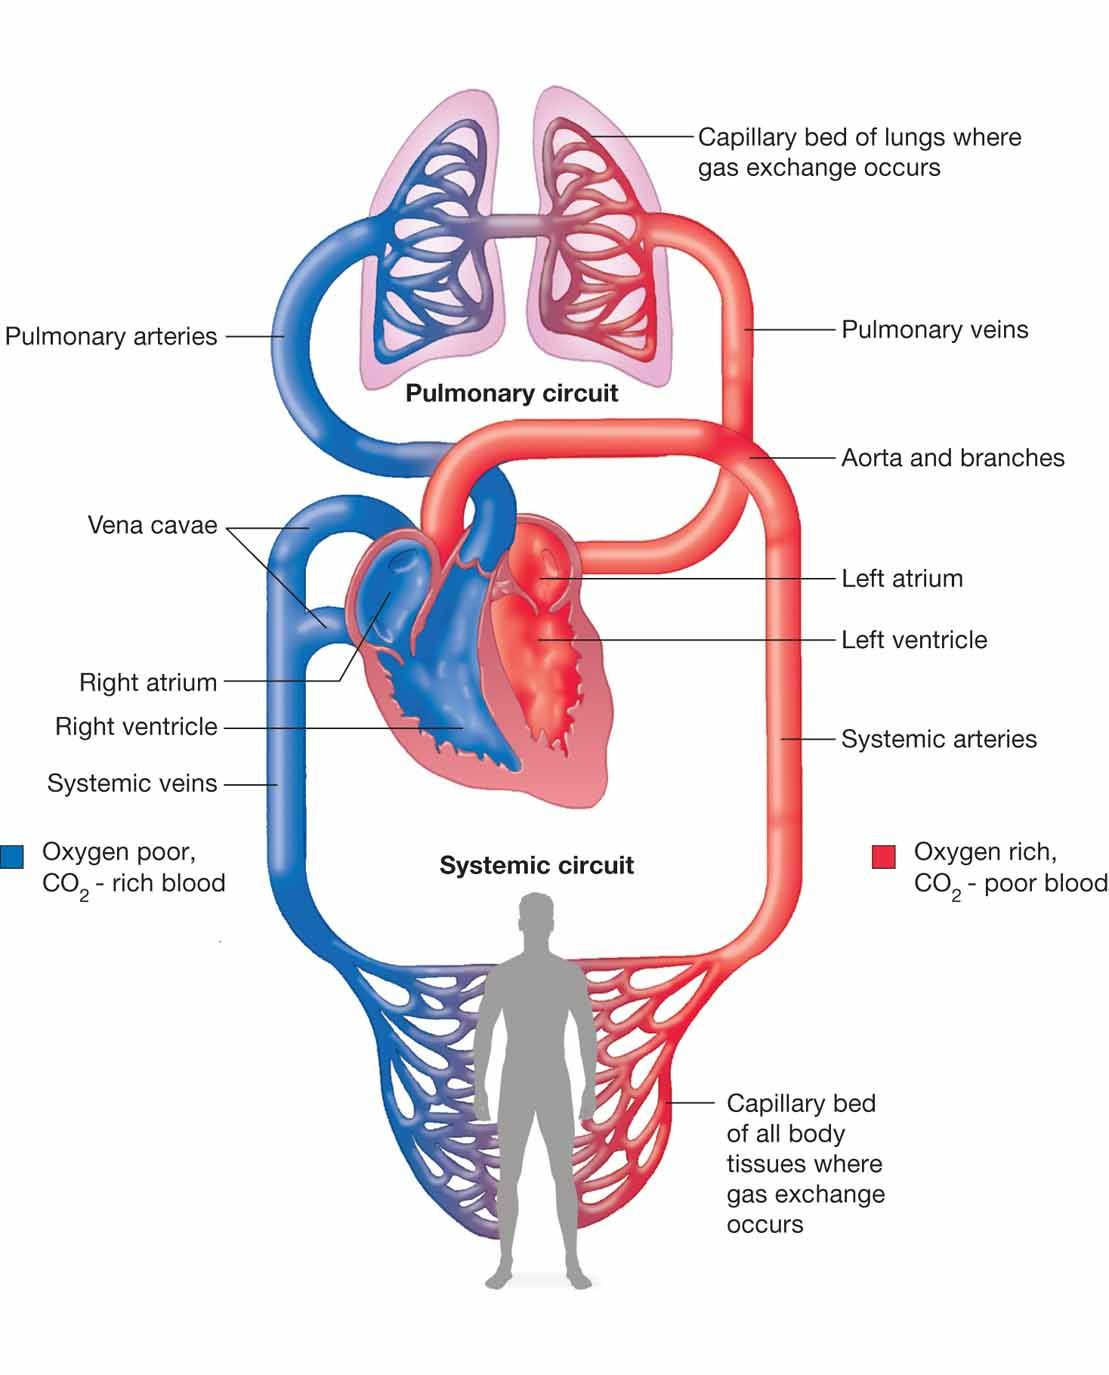 Human Circulatory System Diagram Photos Systemic And Pulmonary Circulation 2